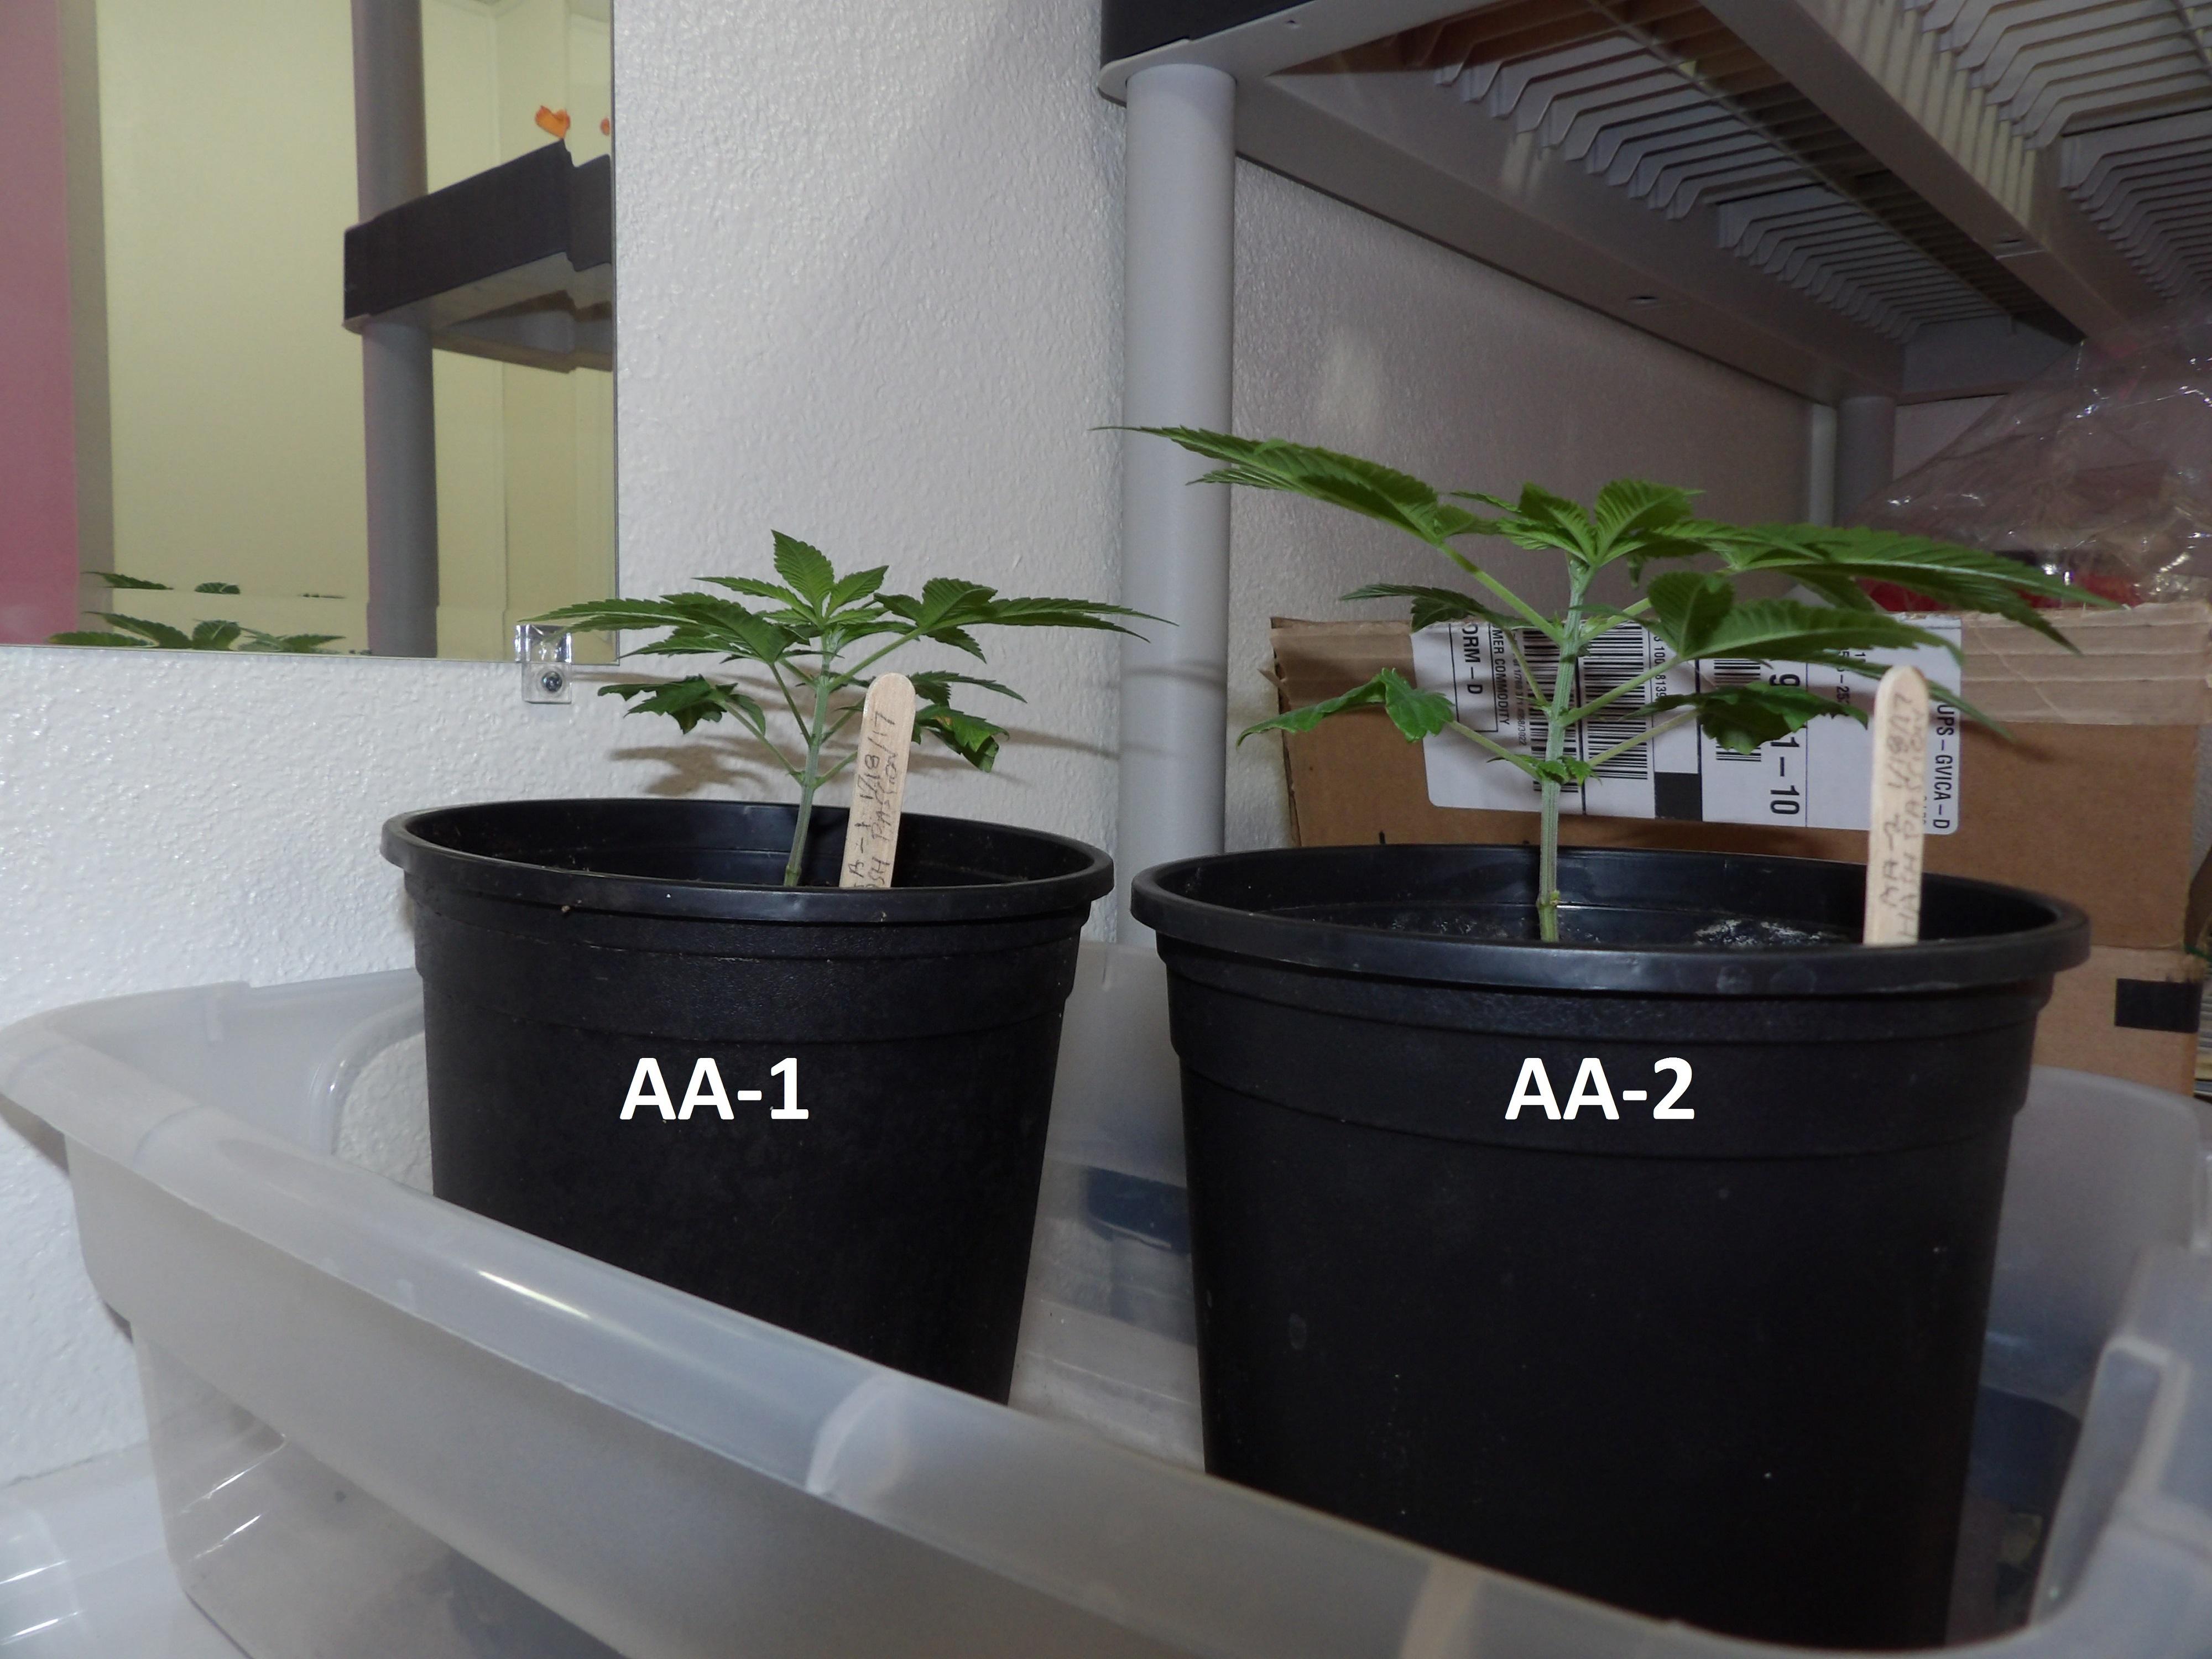 AA-1 and AA-2 1-29-17